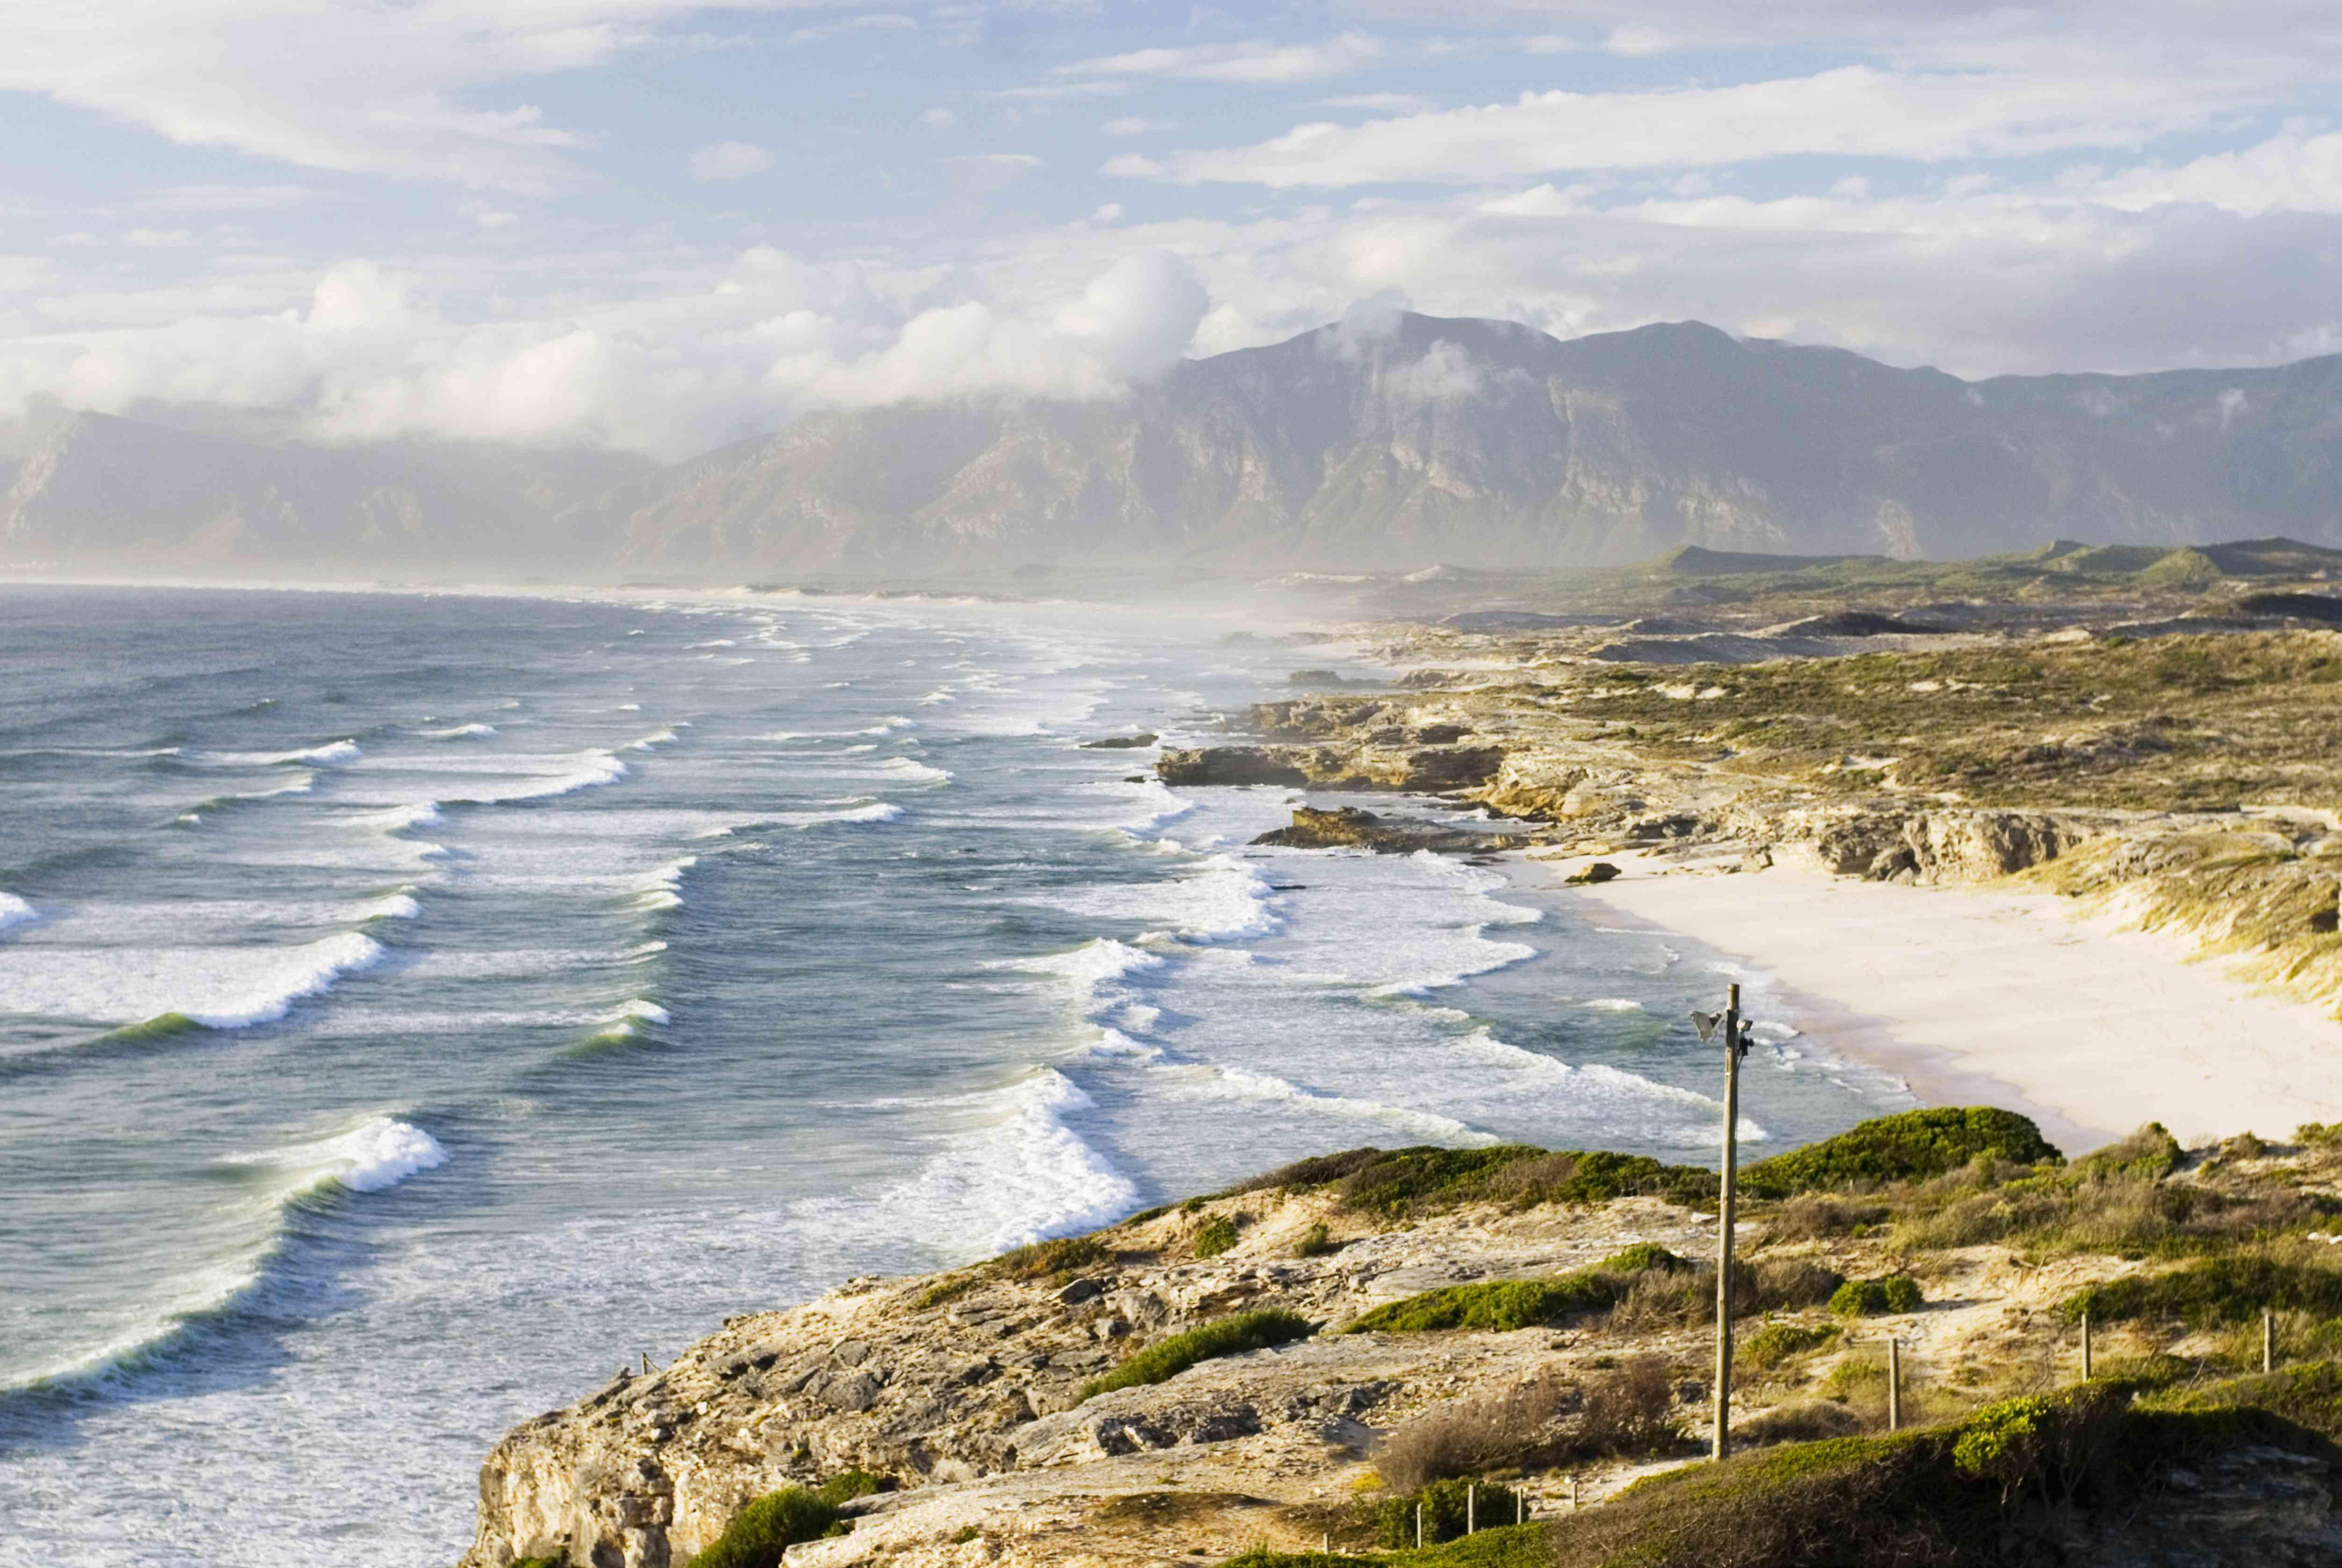 South Africa, Gansbaai, Walker Bay Nature 'Reserve